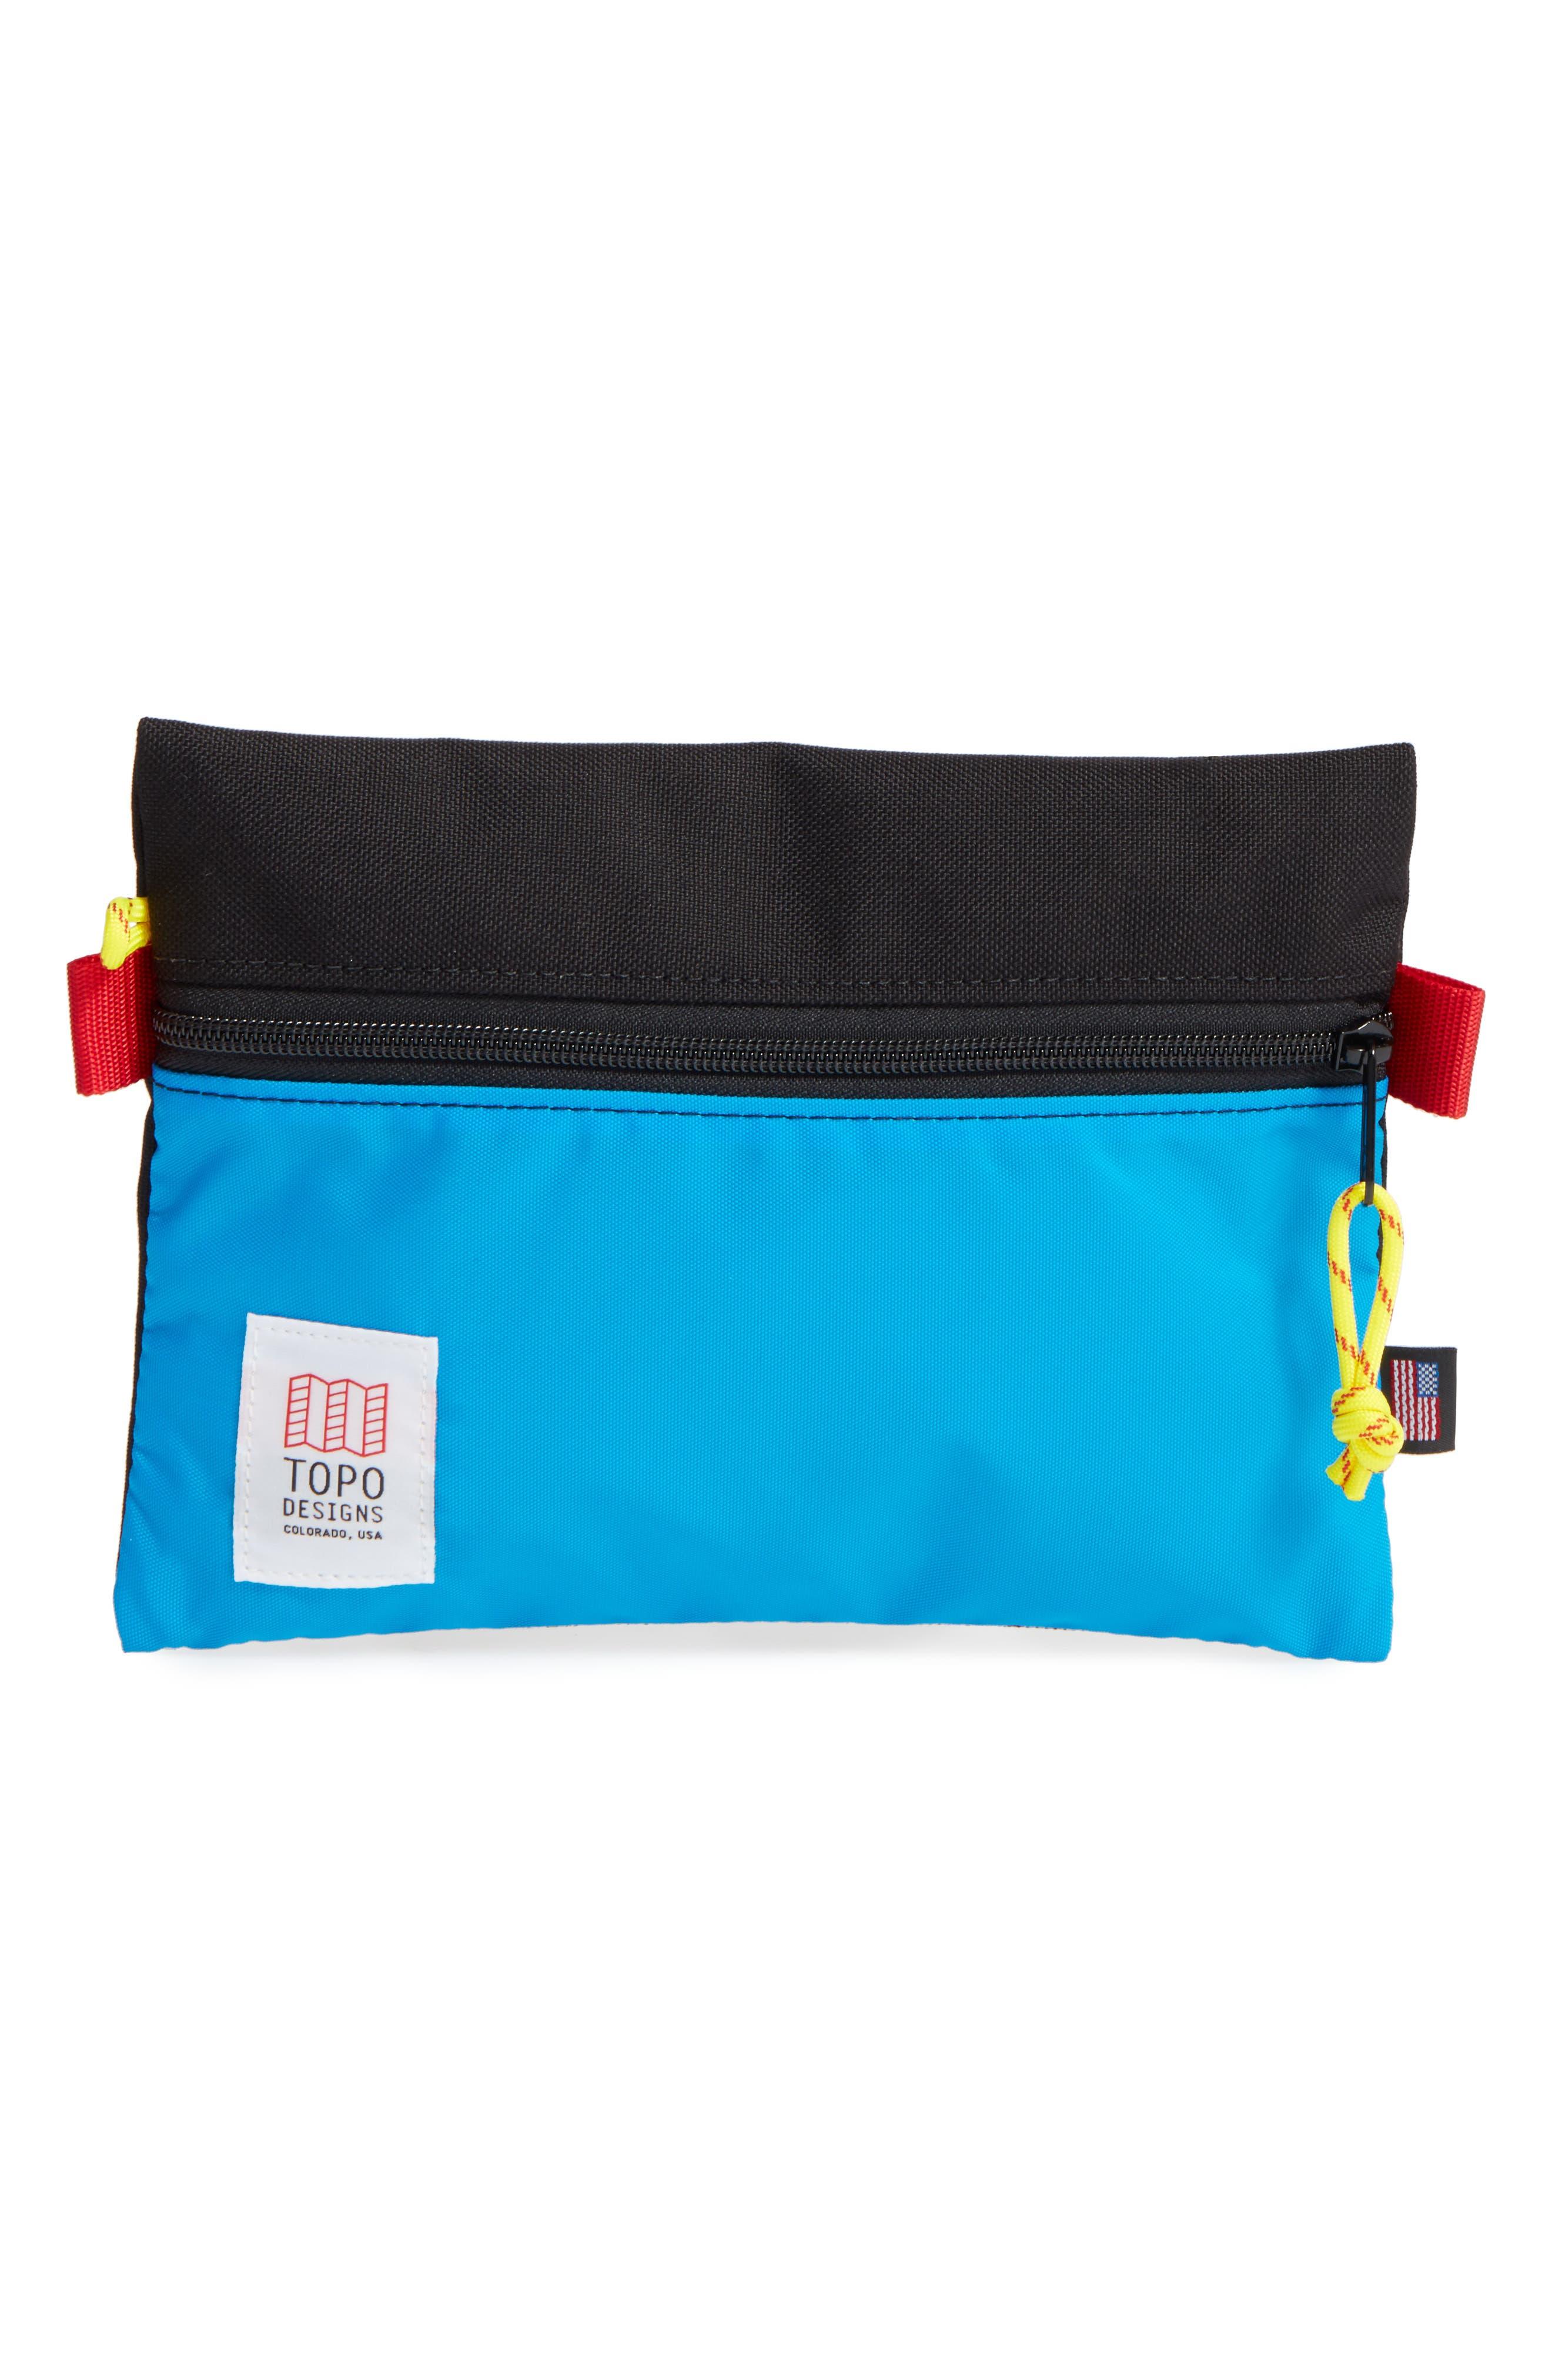 TopoDesigns Accessory Bag